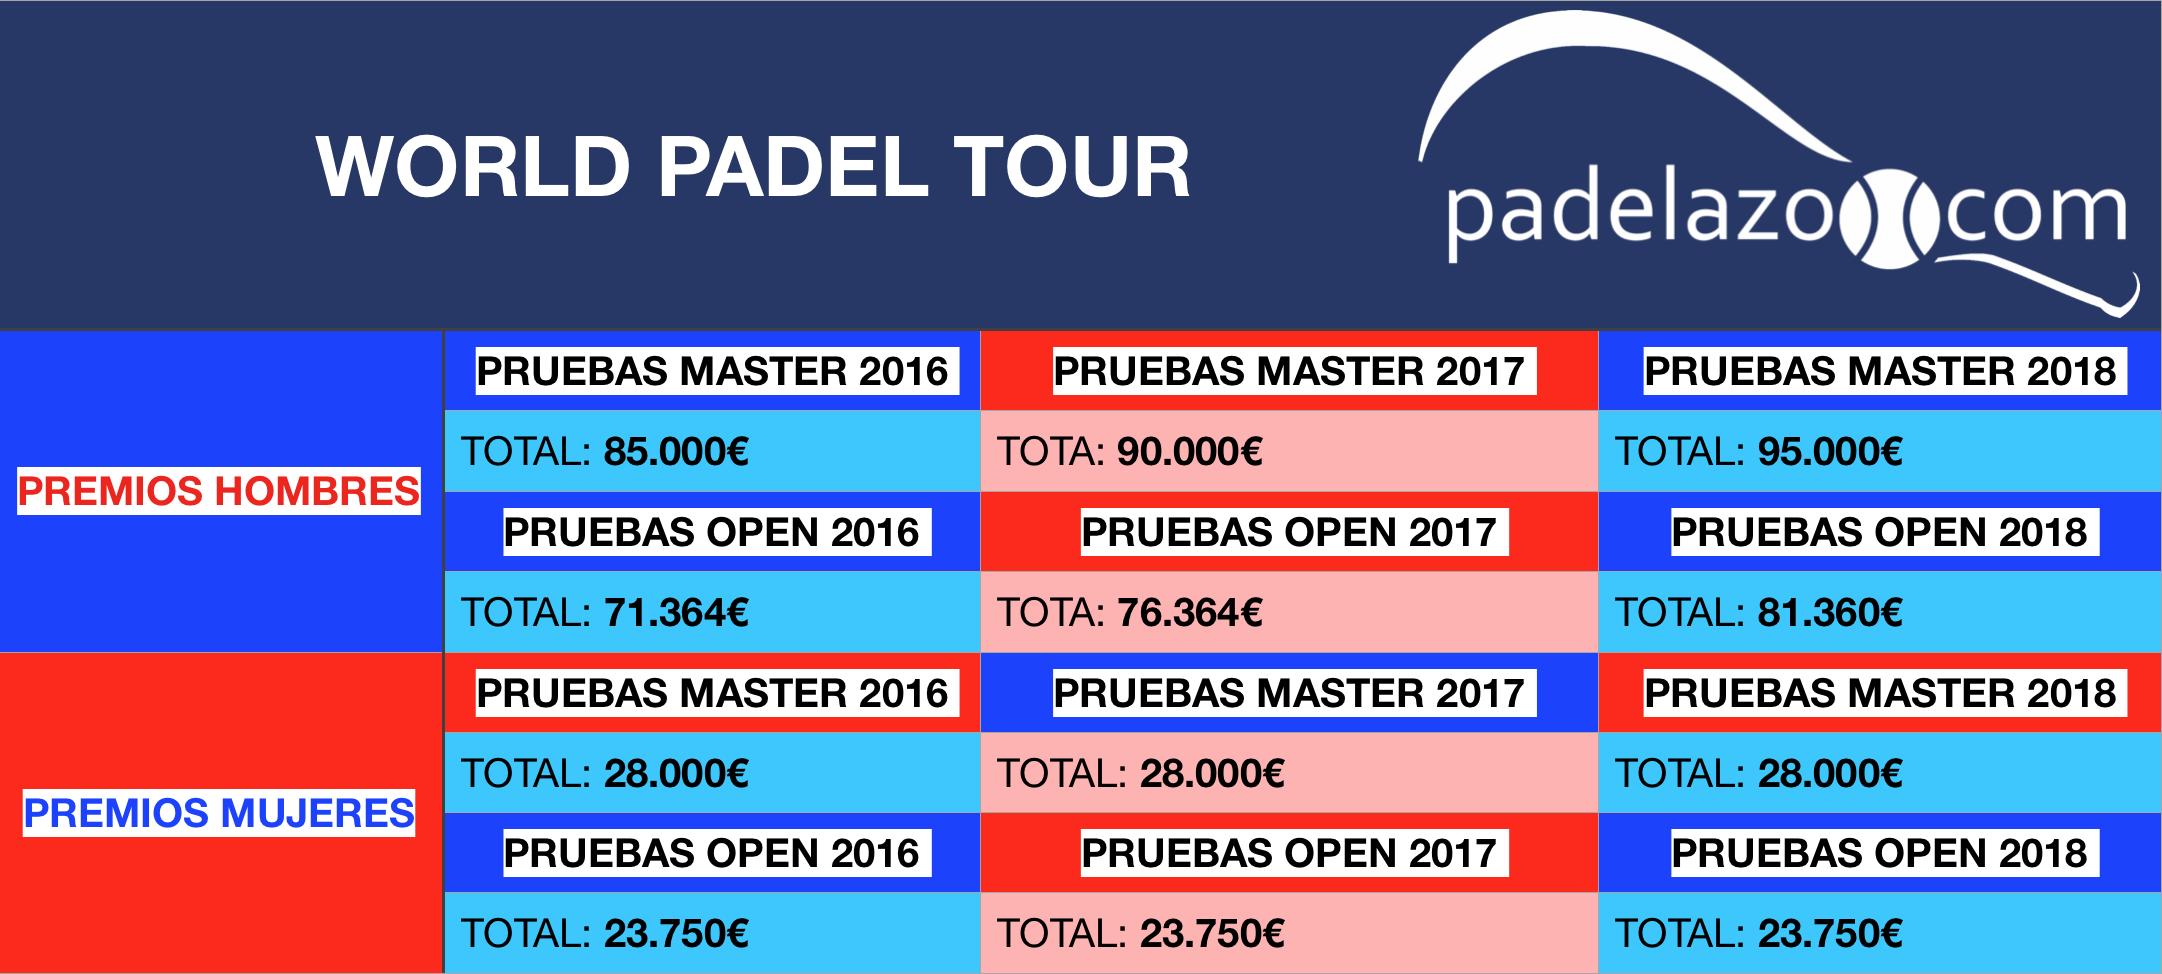 comparativa premios totales world padel tour masculino y femenino 2018